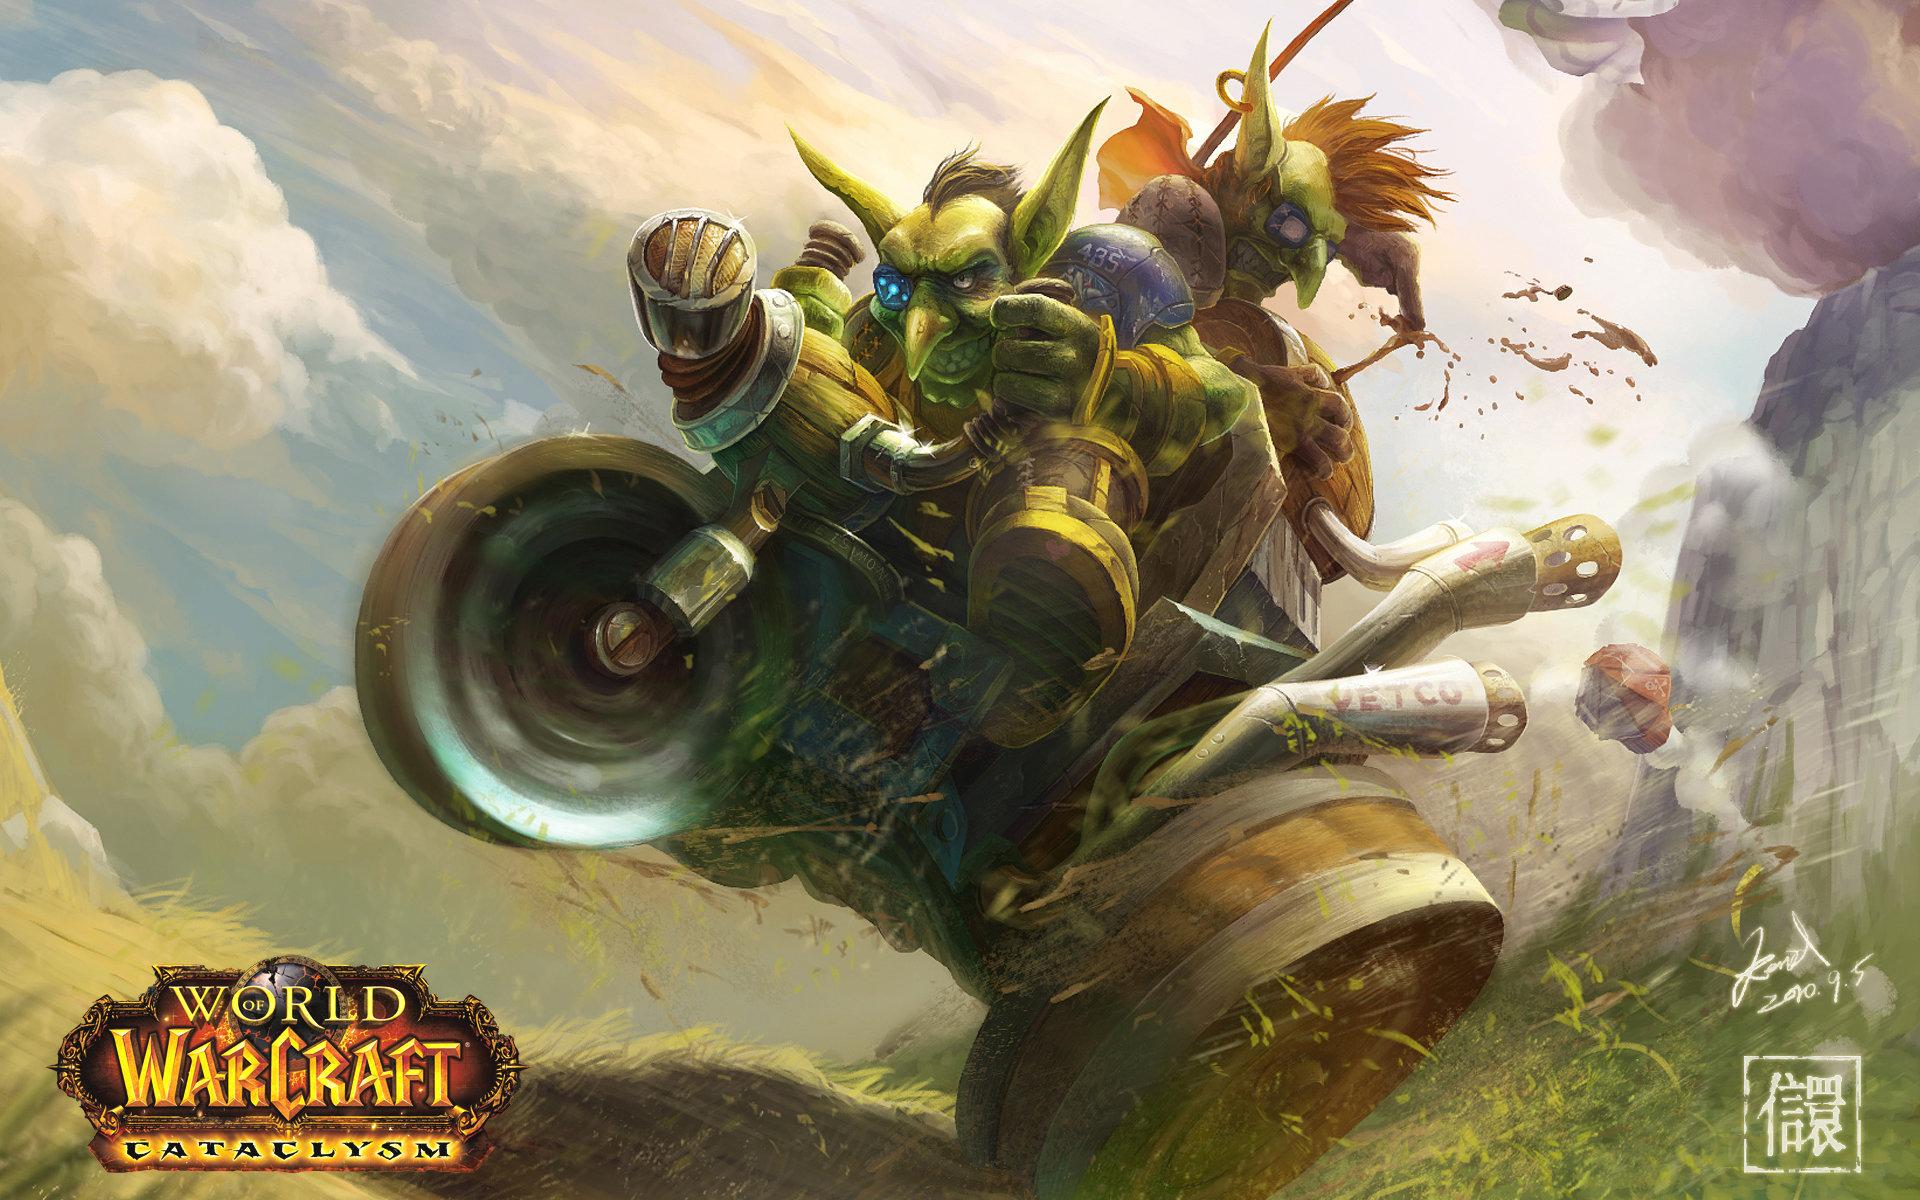 Warcraft henatai goblins porn scenes